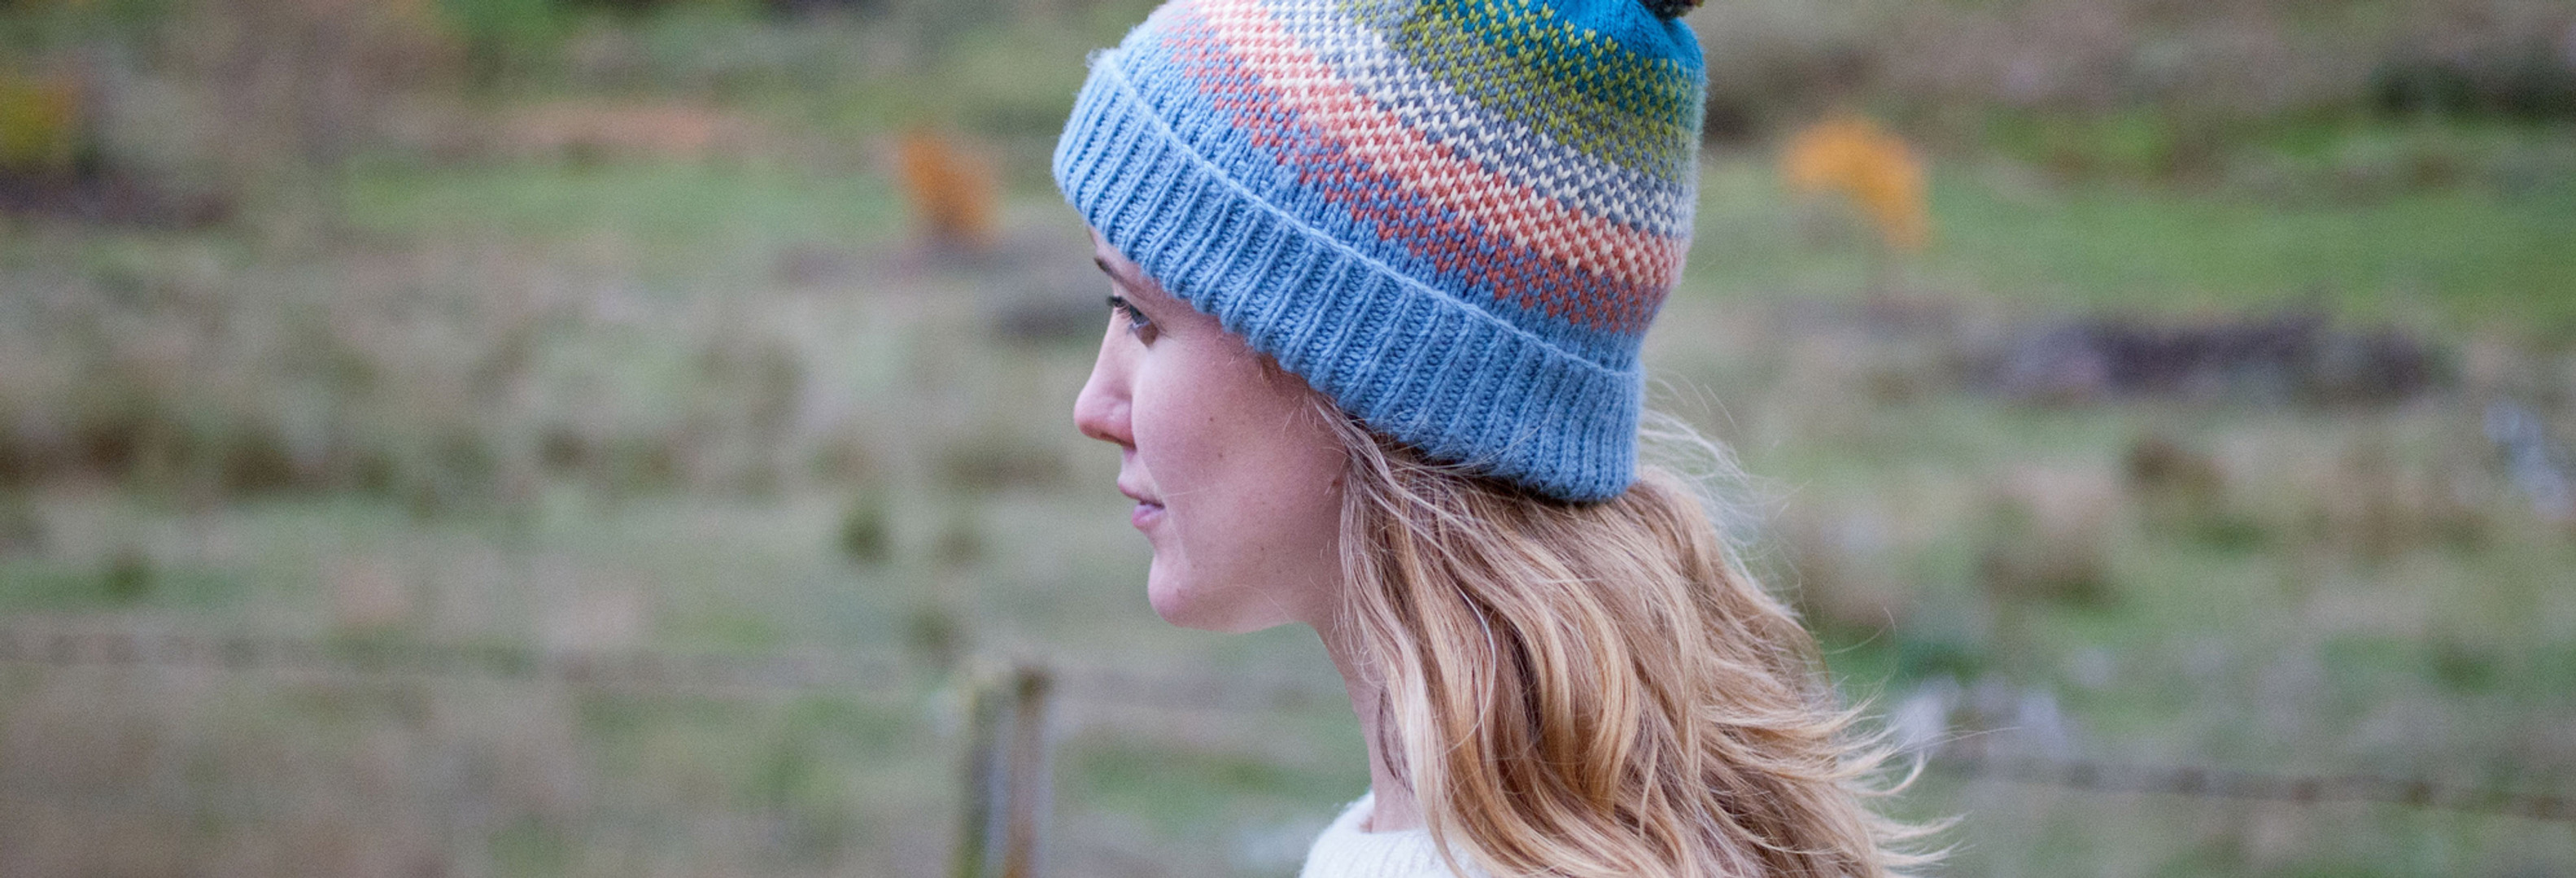 Millpost Merino Knitted2.jpg